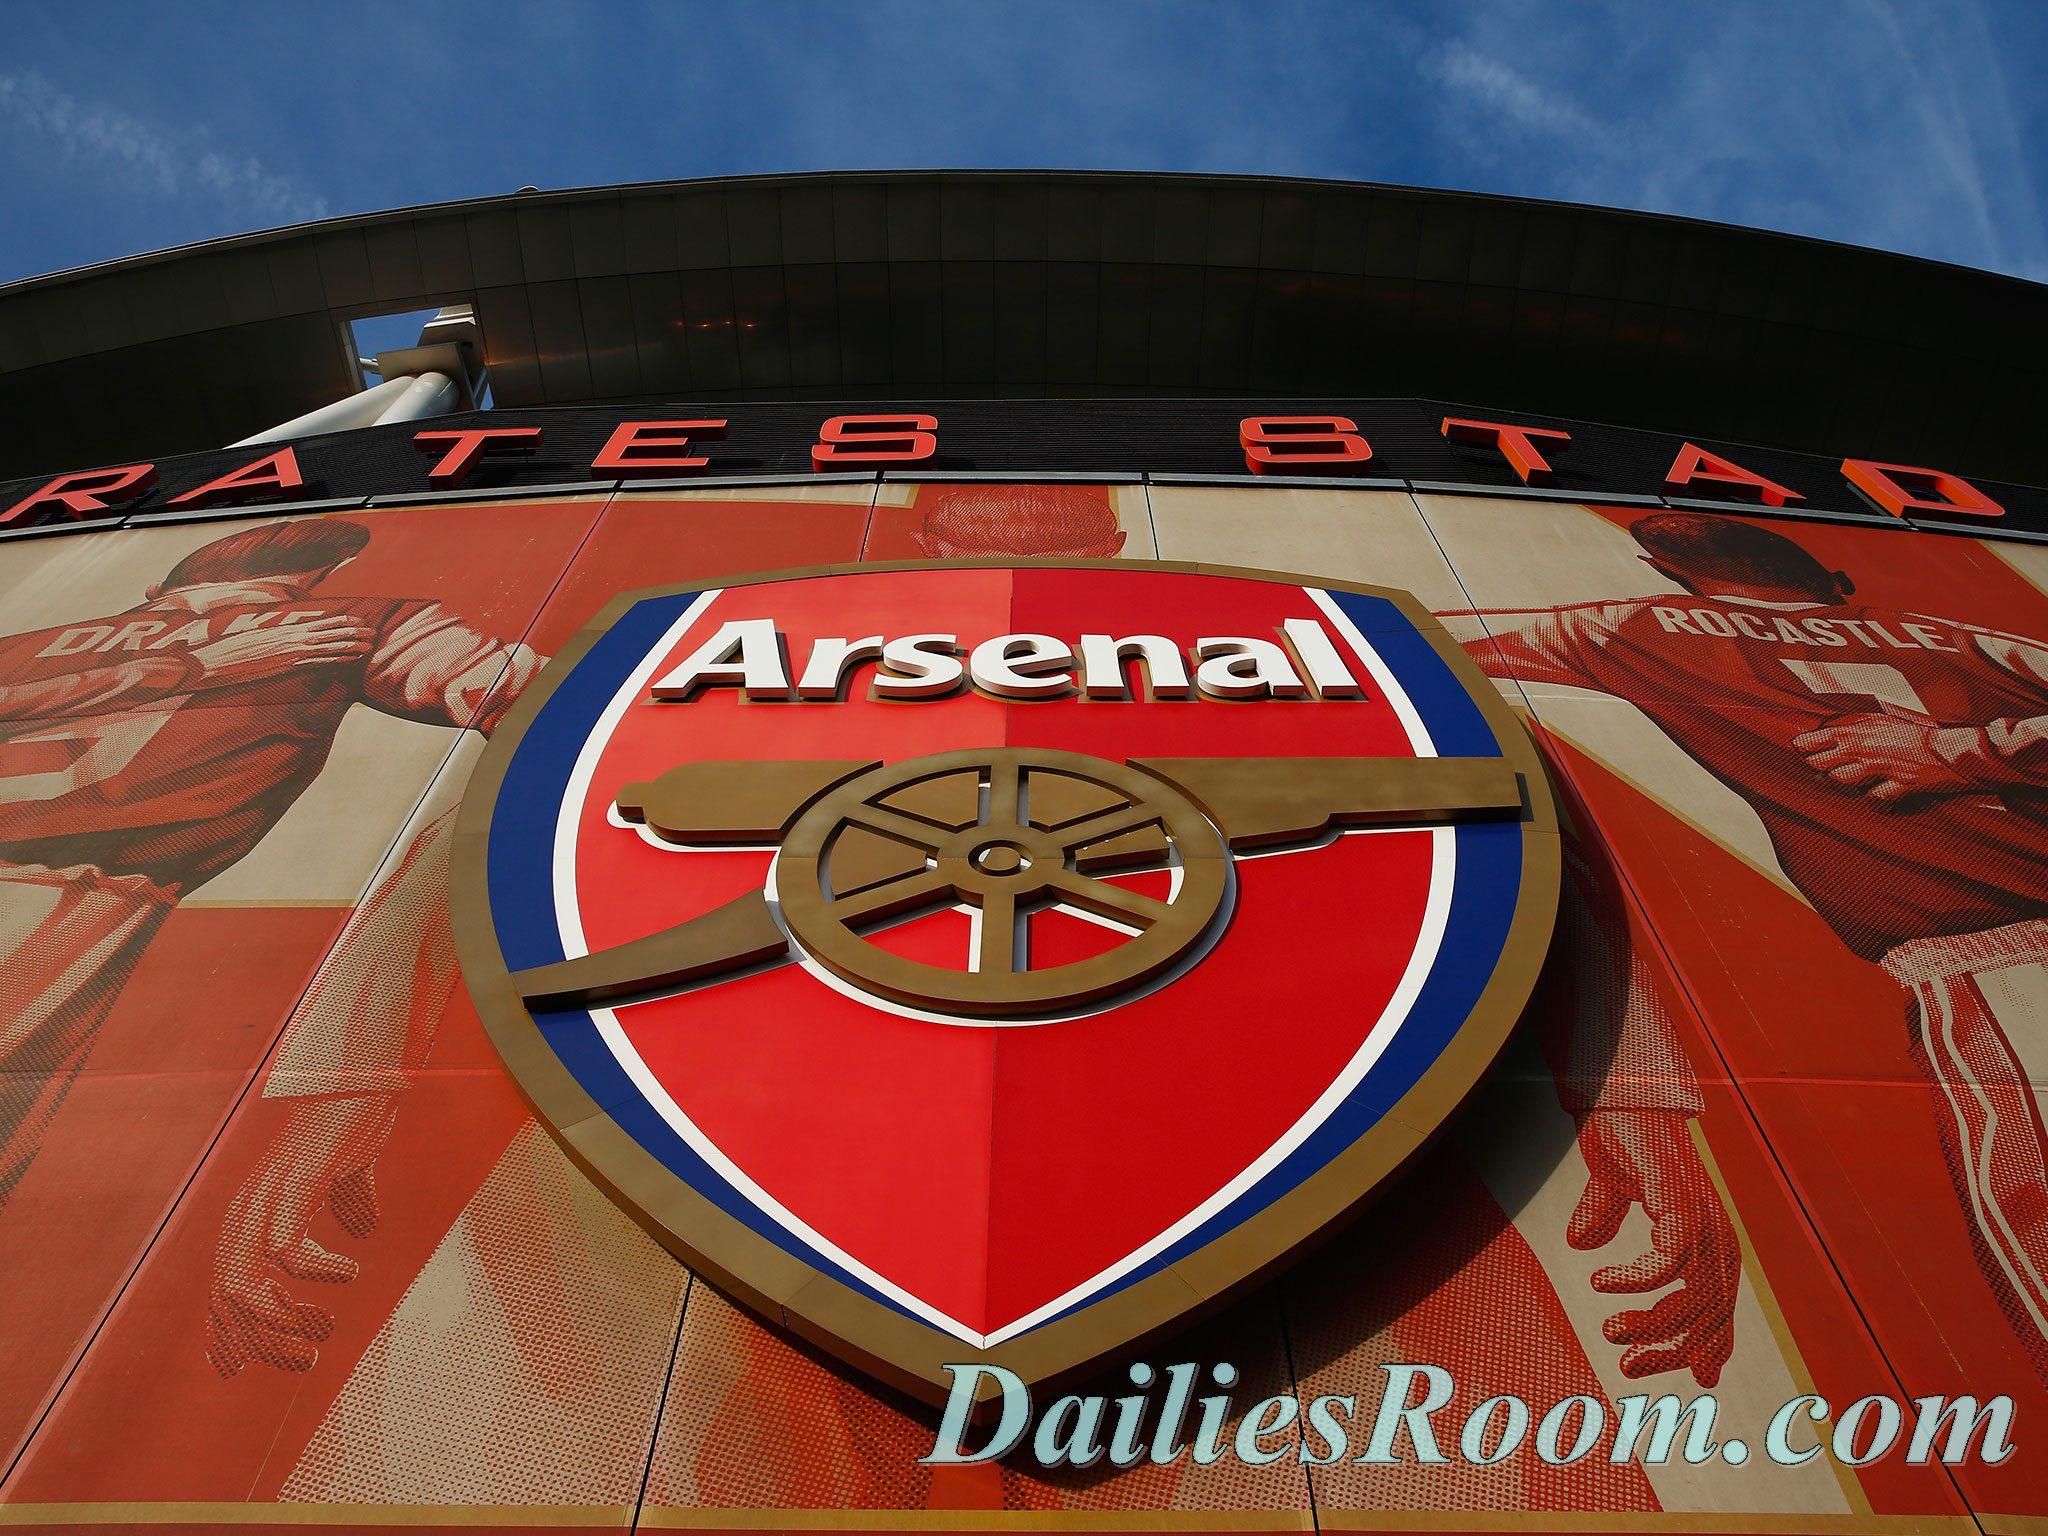 Arsenal epl fixtures apama epl scores